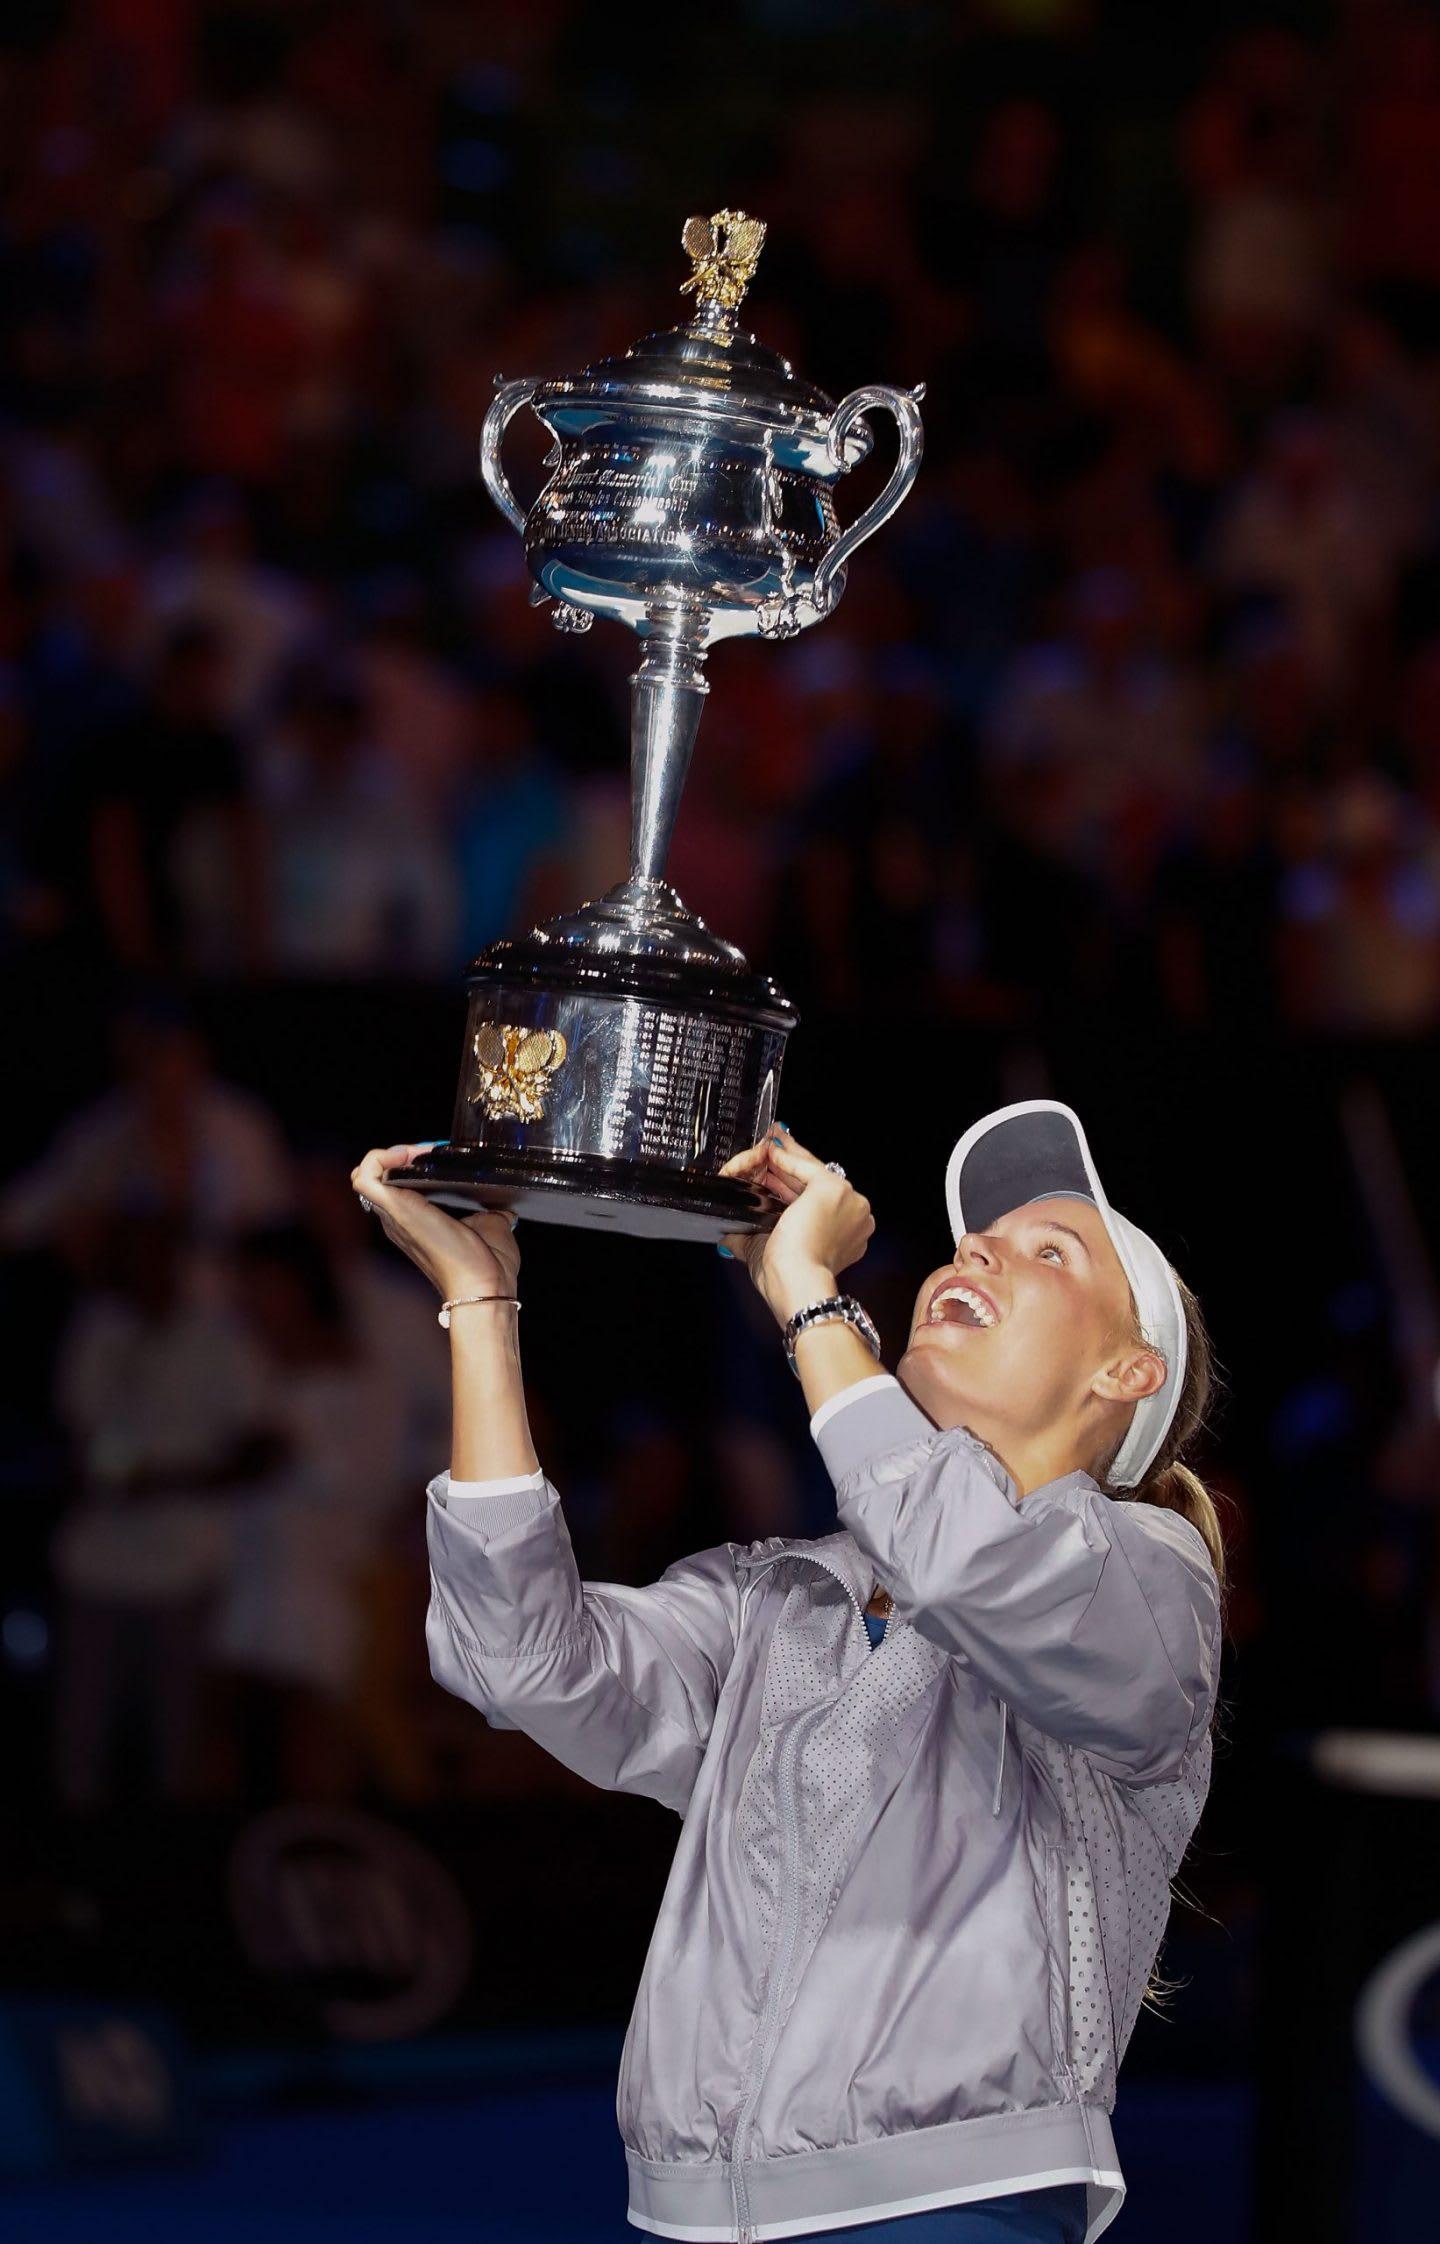 Woman wearing grey tennis outfit holding silver trophy during celebration, Caroline Wozniacki, tennis, player, Danish, athlete, Australia, Melbourne, winner